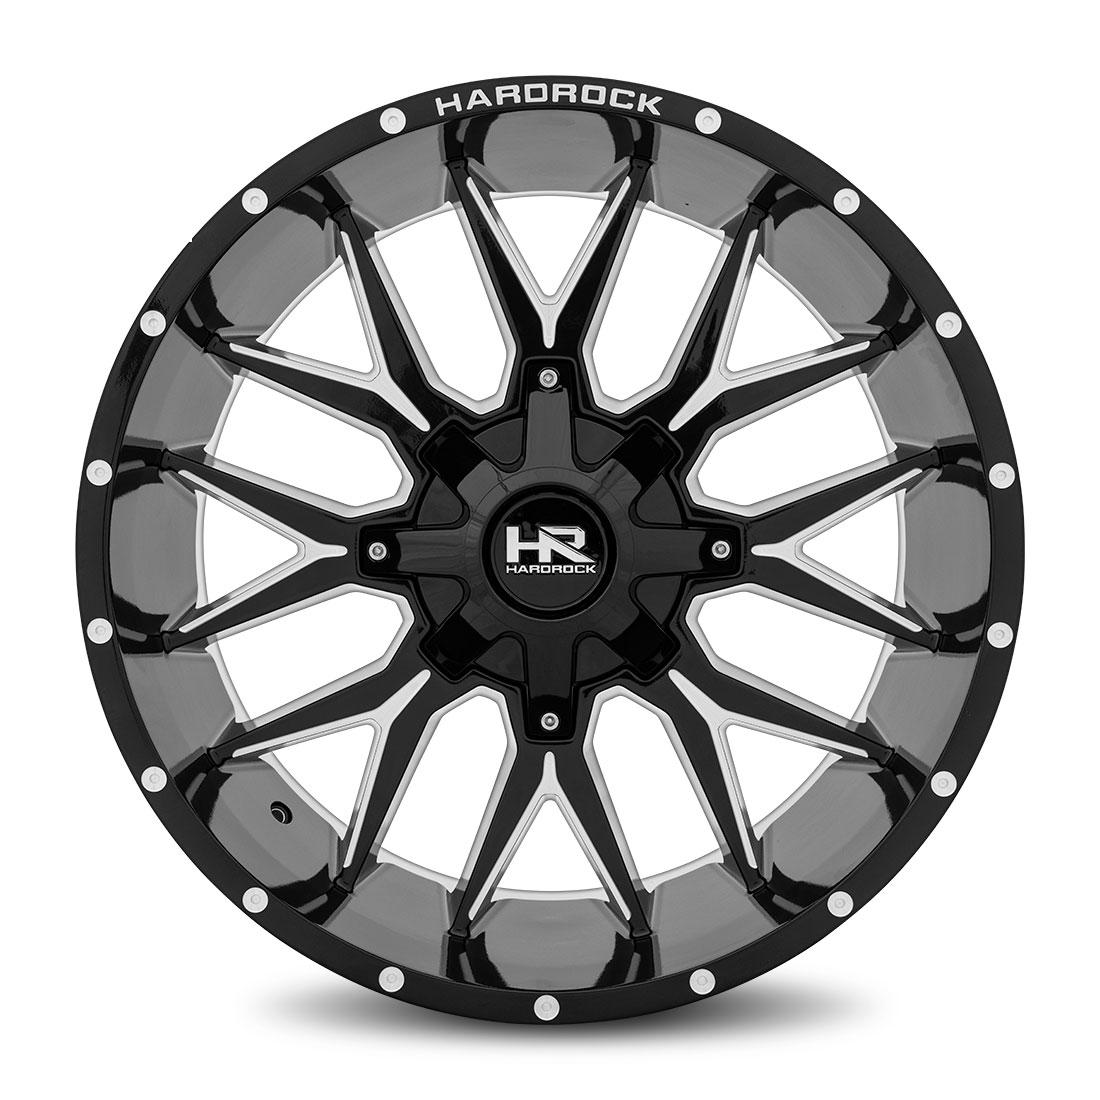 Hardrock Offroad Wheels H700 Affliction - Gloss Black Milled - 22x10